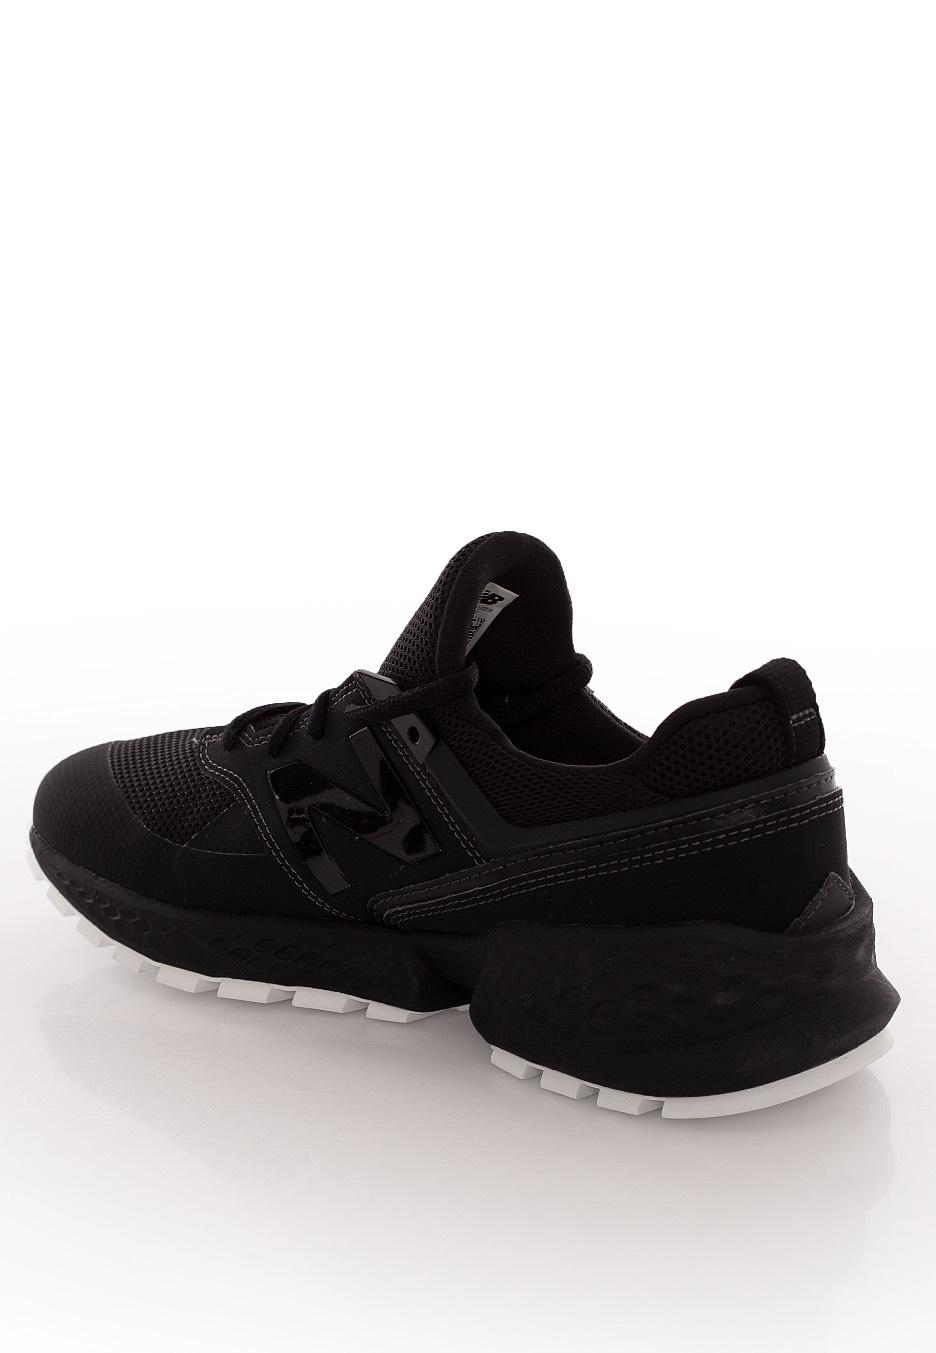 New Balance - MS574 D KTB Grey - Shoes